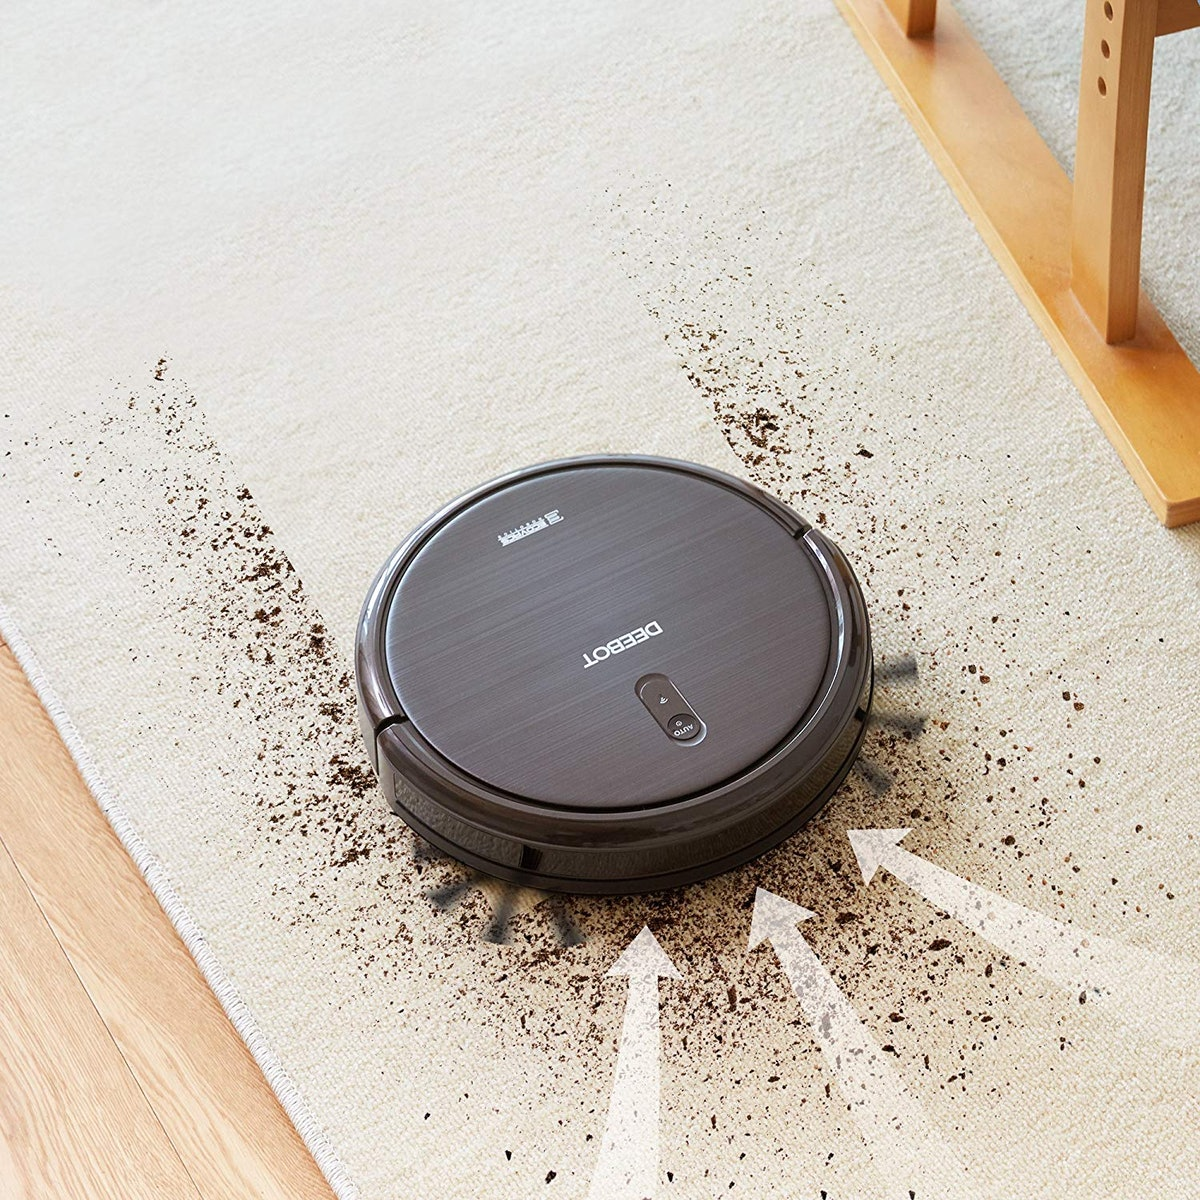 Ecovacs Self-Charging Robot Vacuum